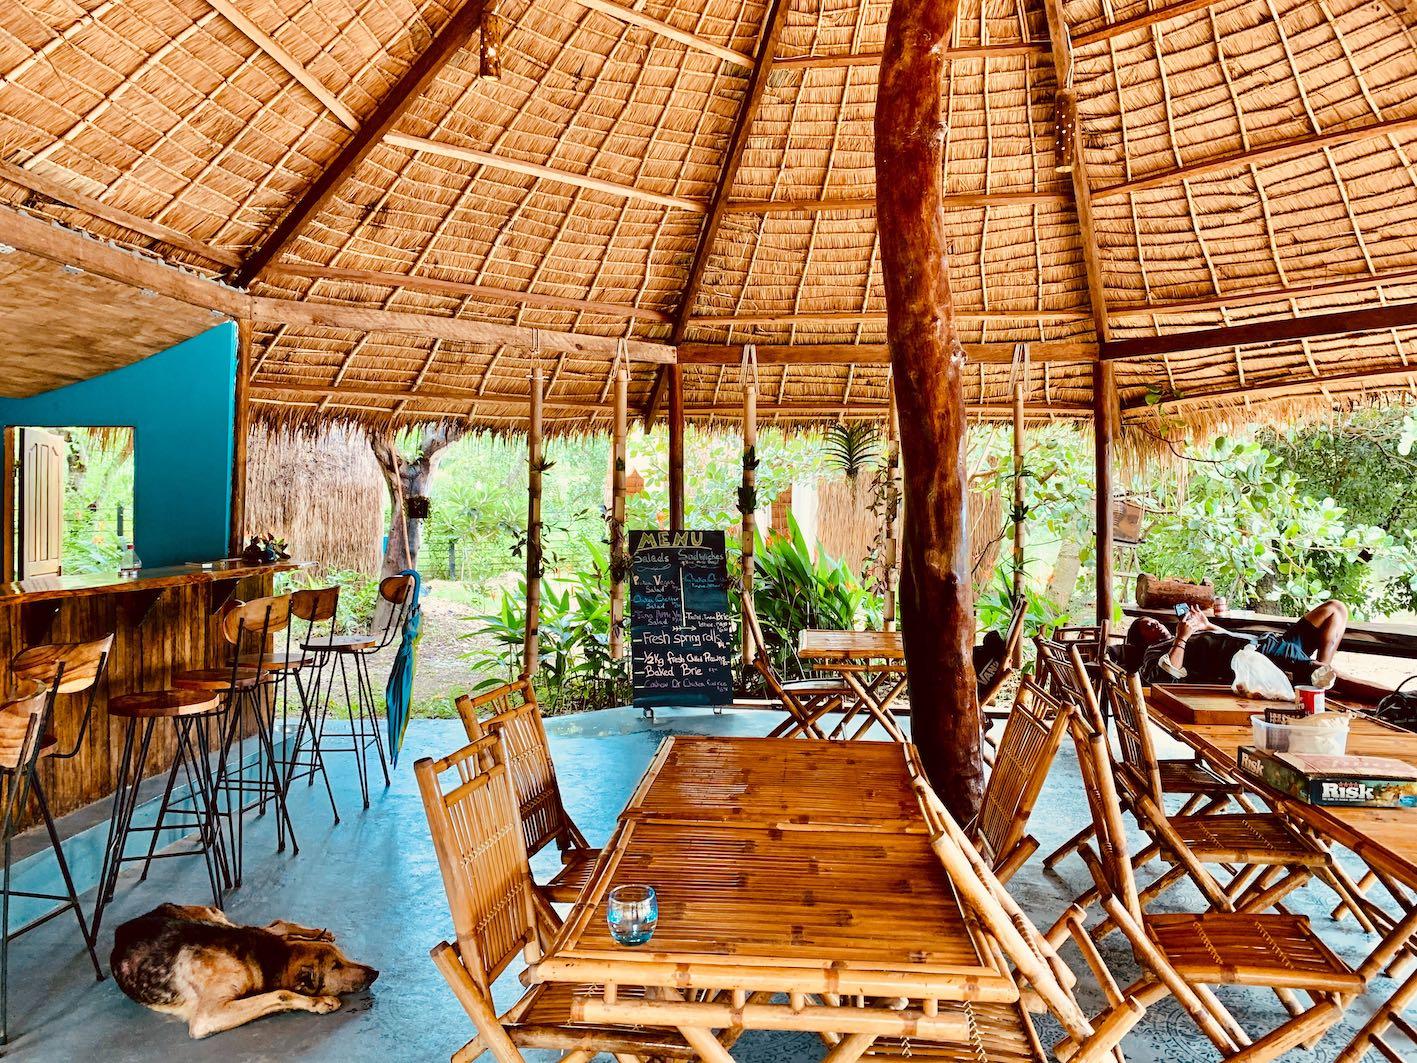 The restaurant at Nibi Spa Kampot Cambodia.